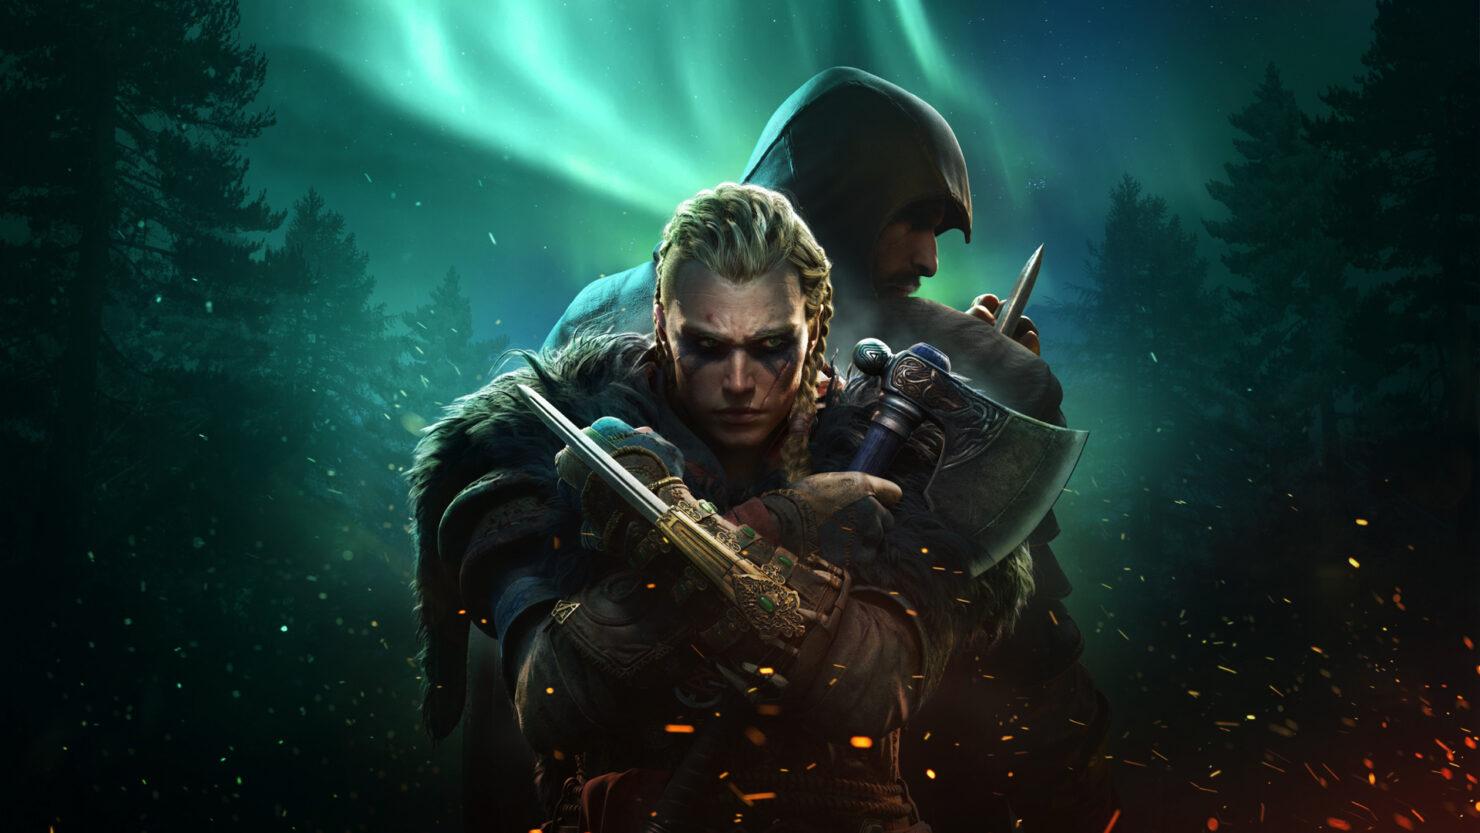 Assassin's Creed Valhalla update 1.3.2